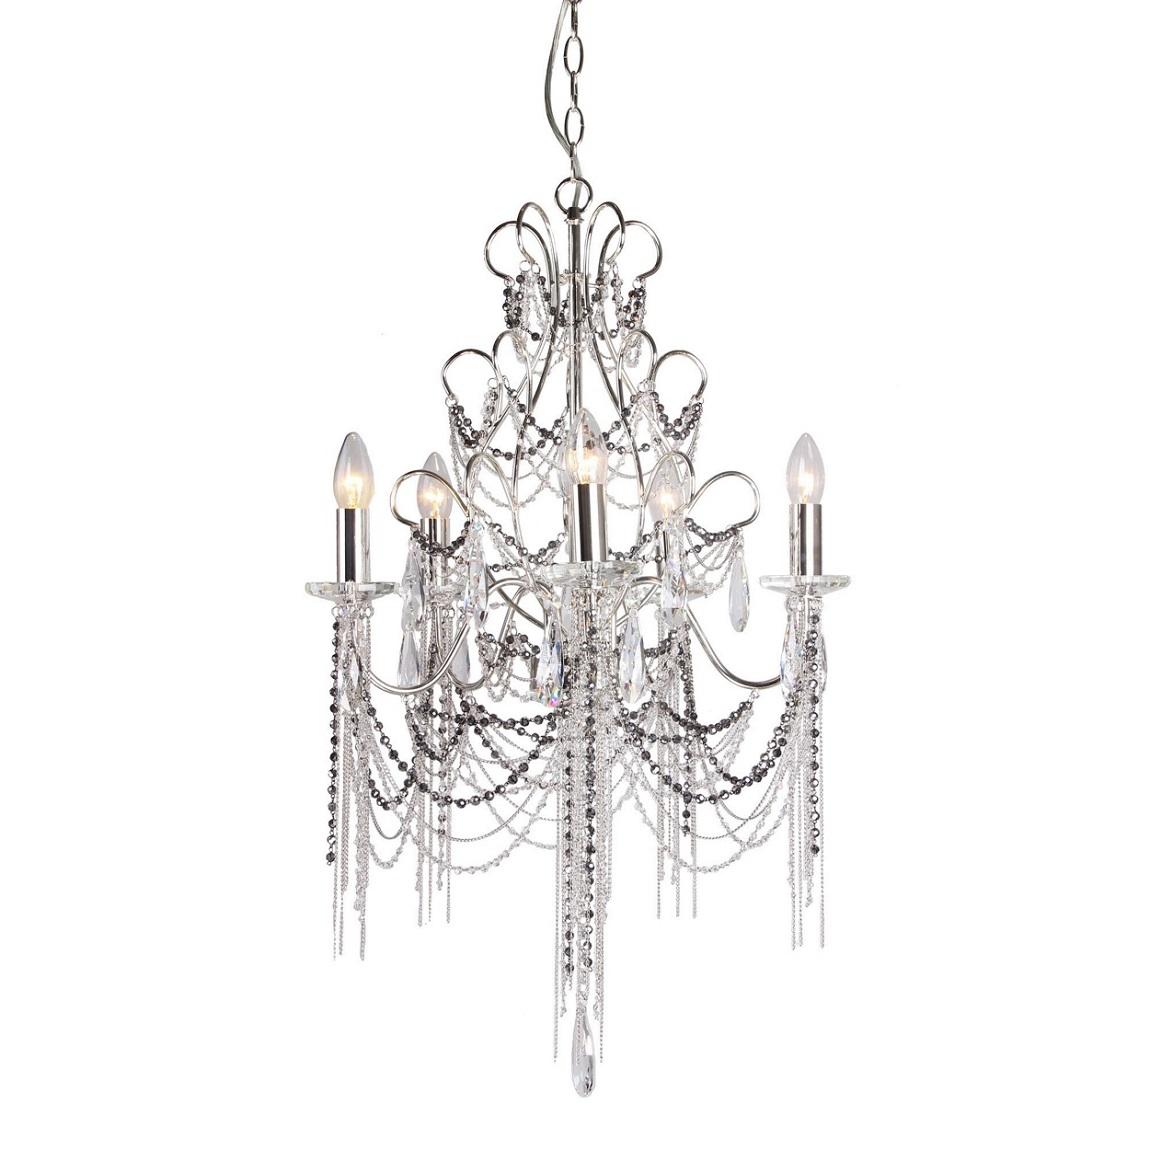 Debenhams ceiling pendants ceiling light ideas debenhams home collection abigail beaded chandelier ceiling light aloadofball Gallery